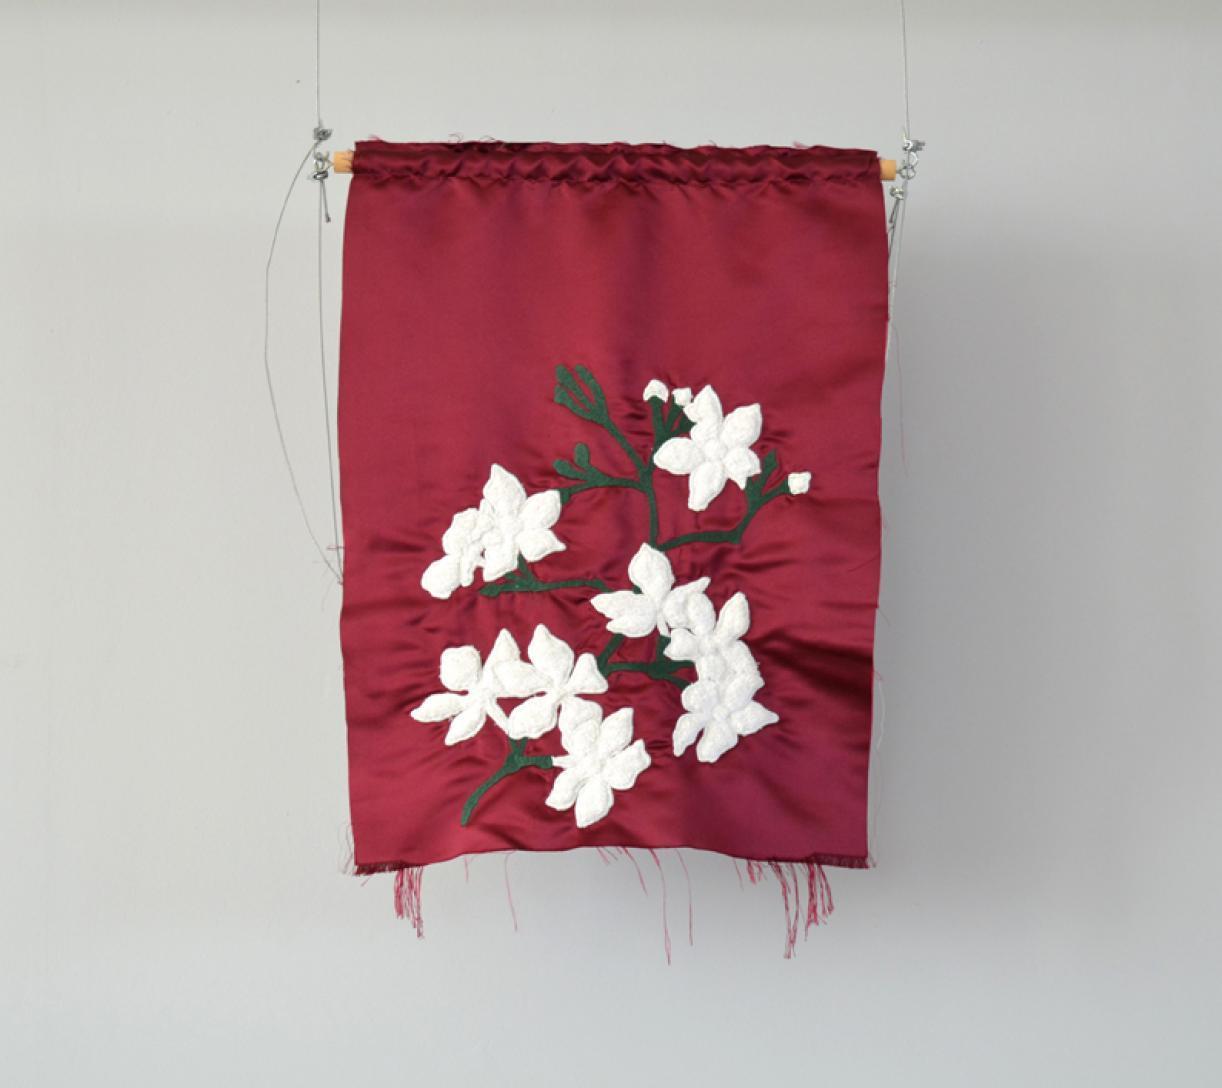 Blazon: Furn el Hayek, Yasmine, 2015, Embroidery and applique on textile, 66 x 49 cm, Ed. 3 + 2 AP